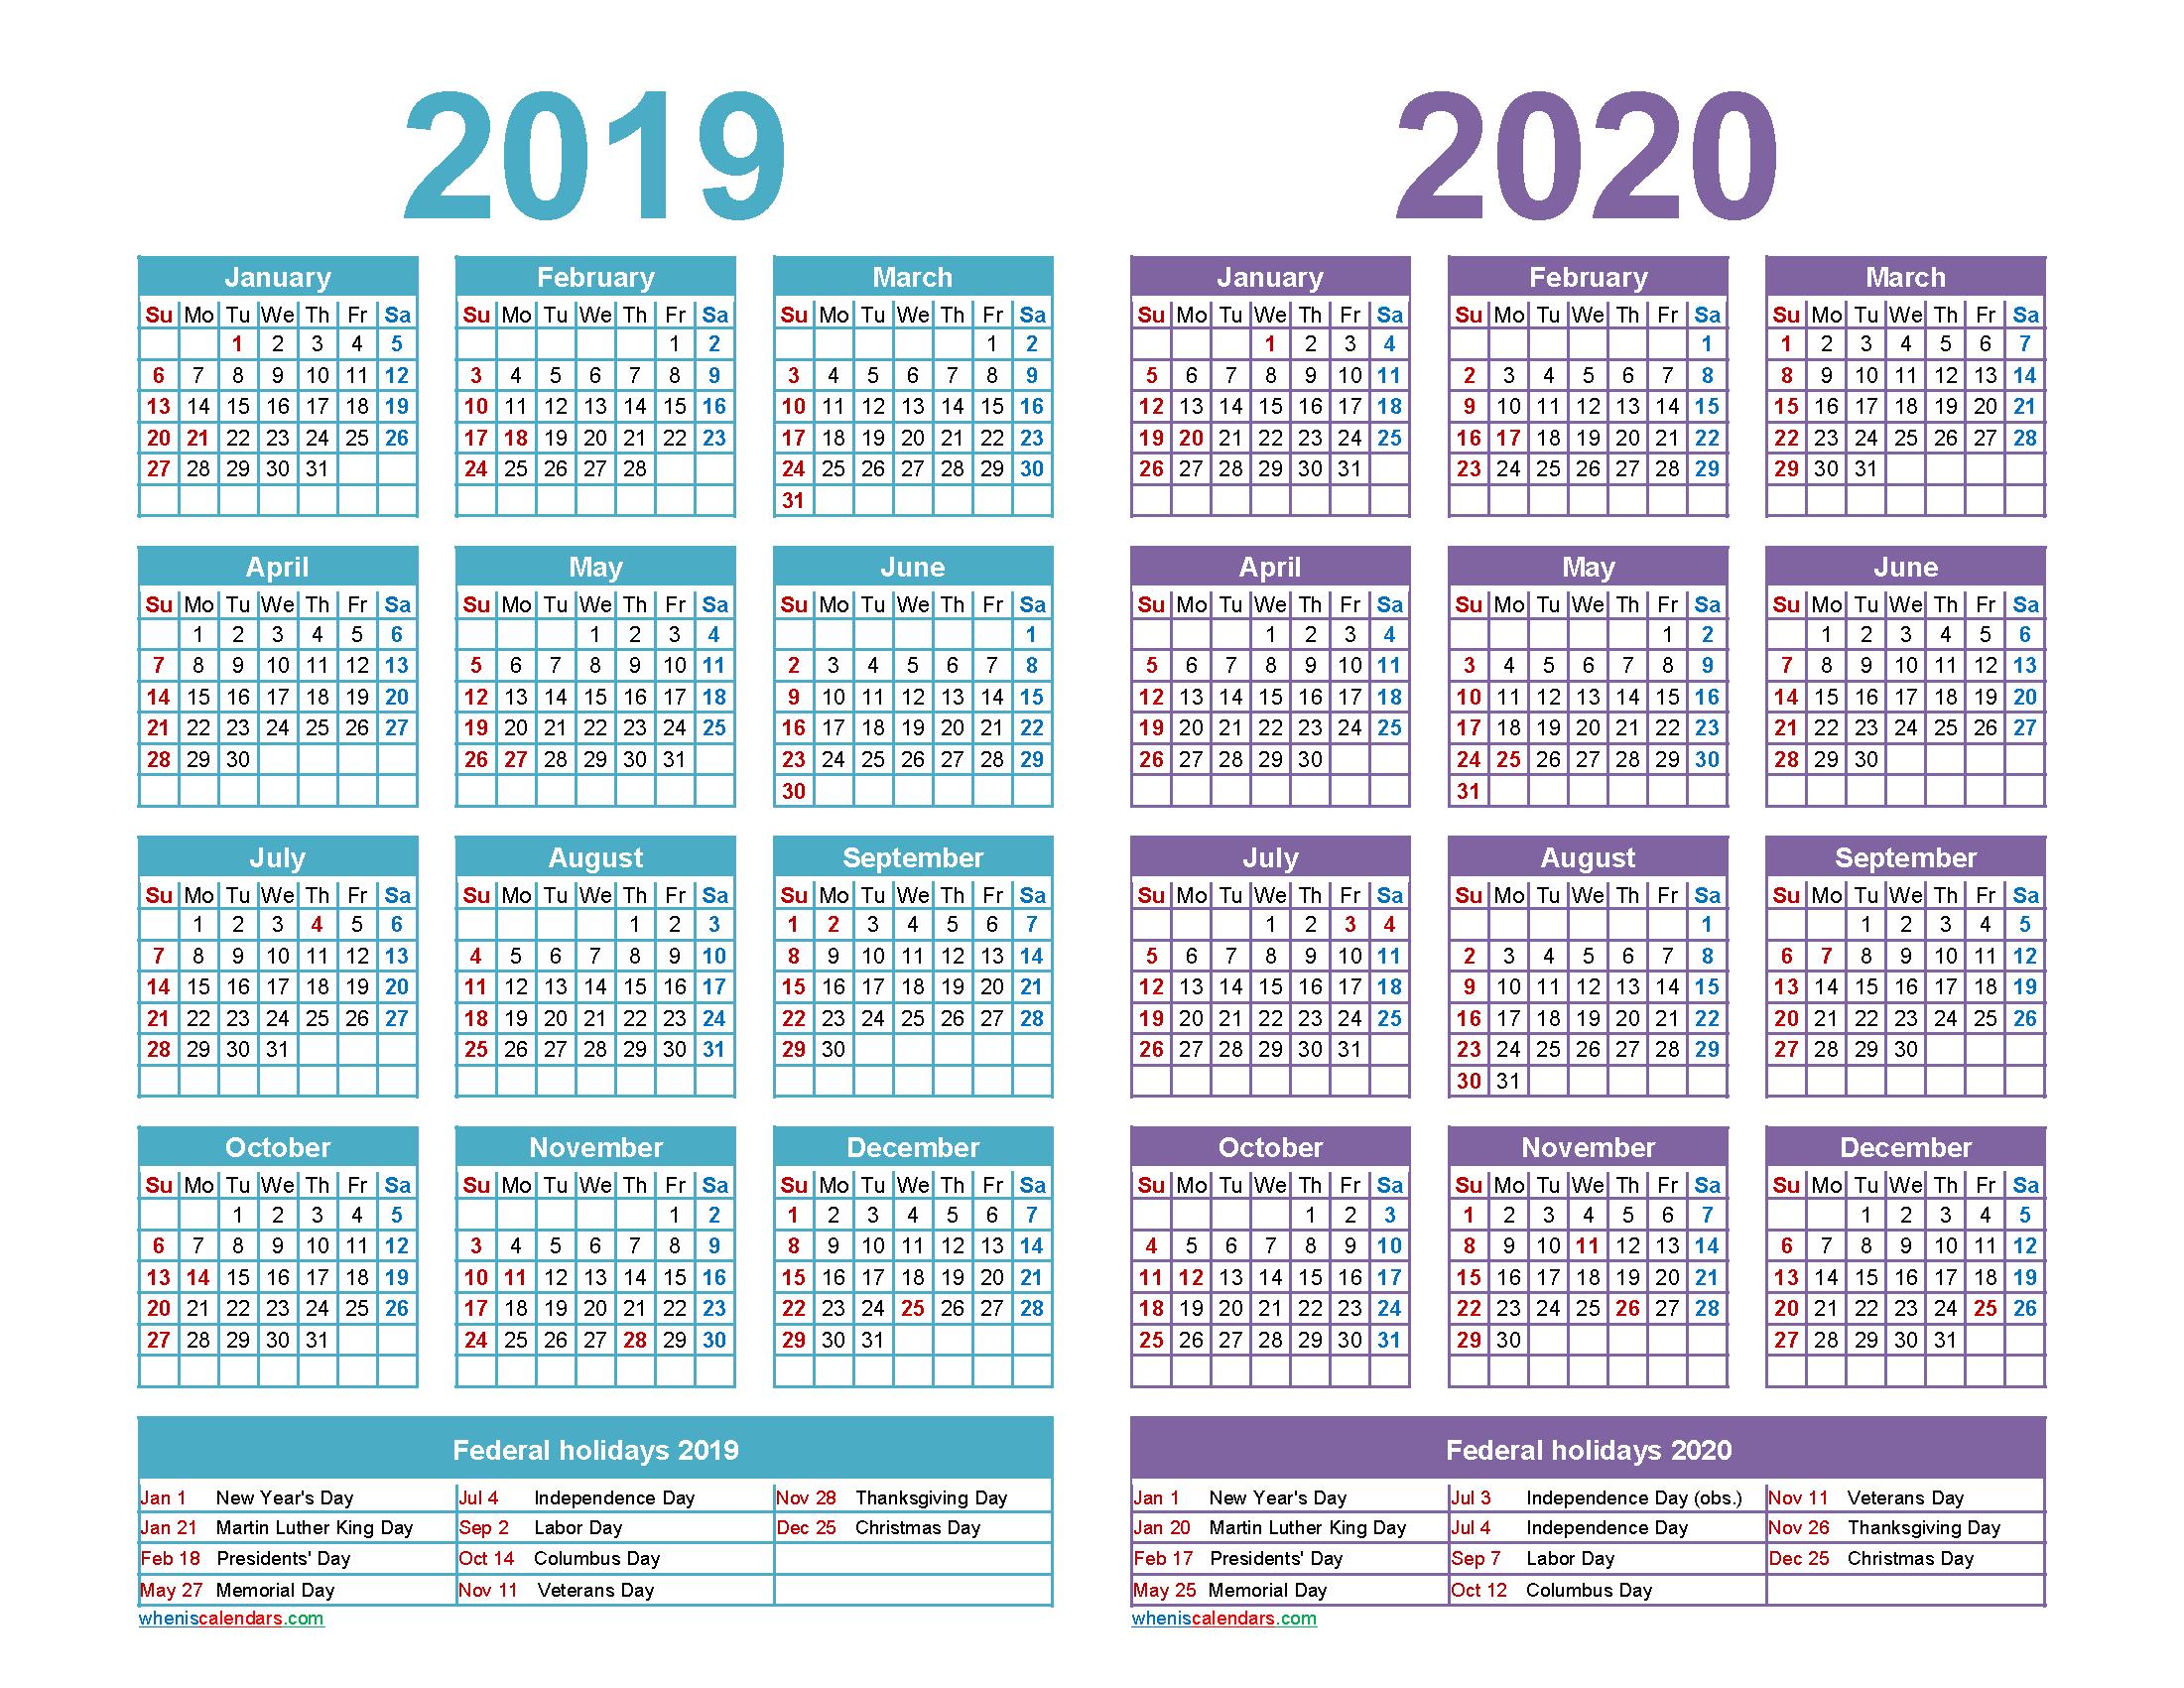 Free 2019 2020 Calendar Printable Word, PDF